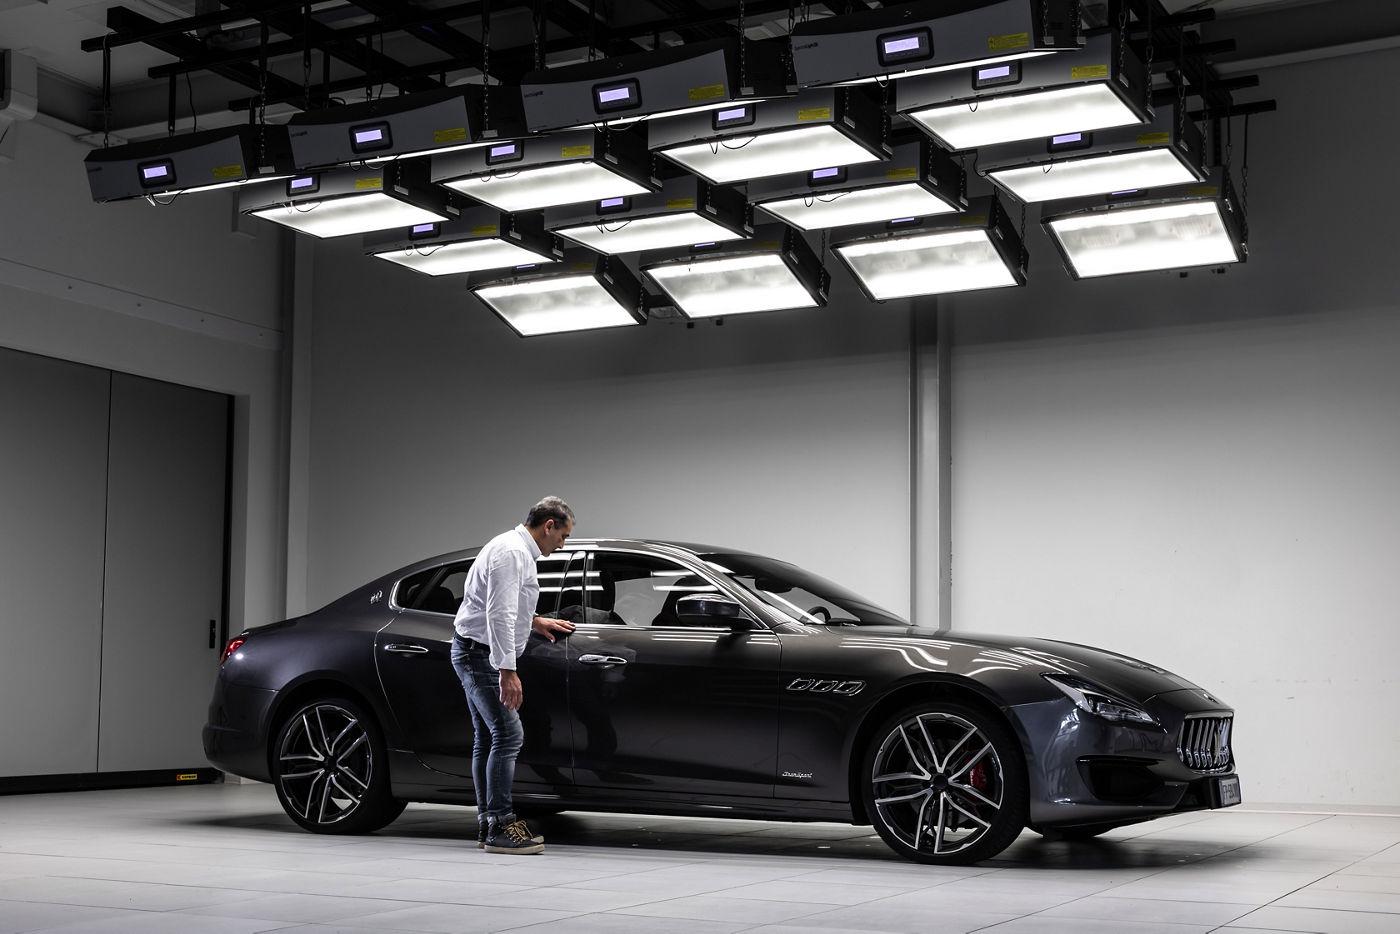 Maserati Innovation Lab - Harmony Room